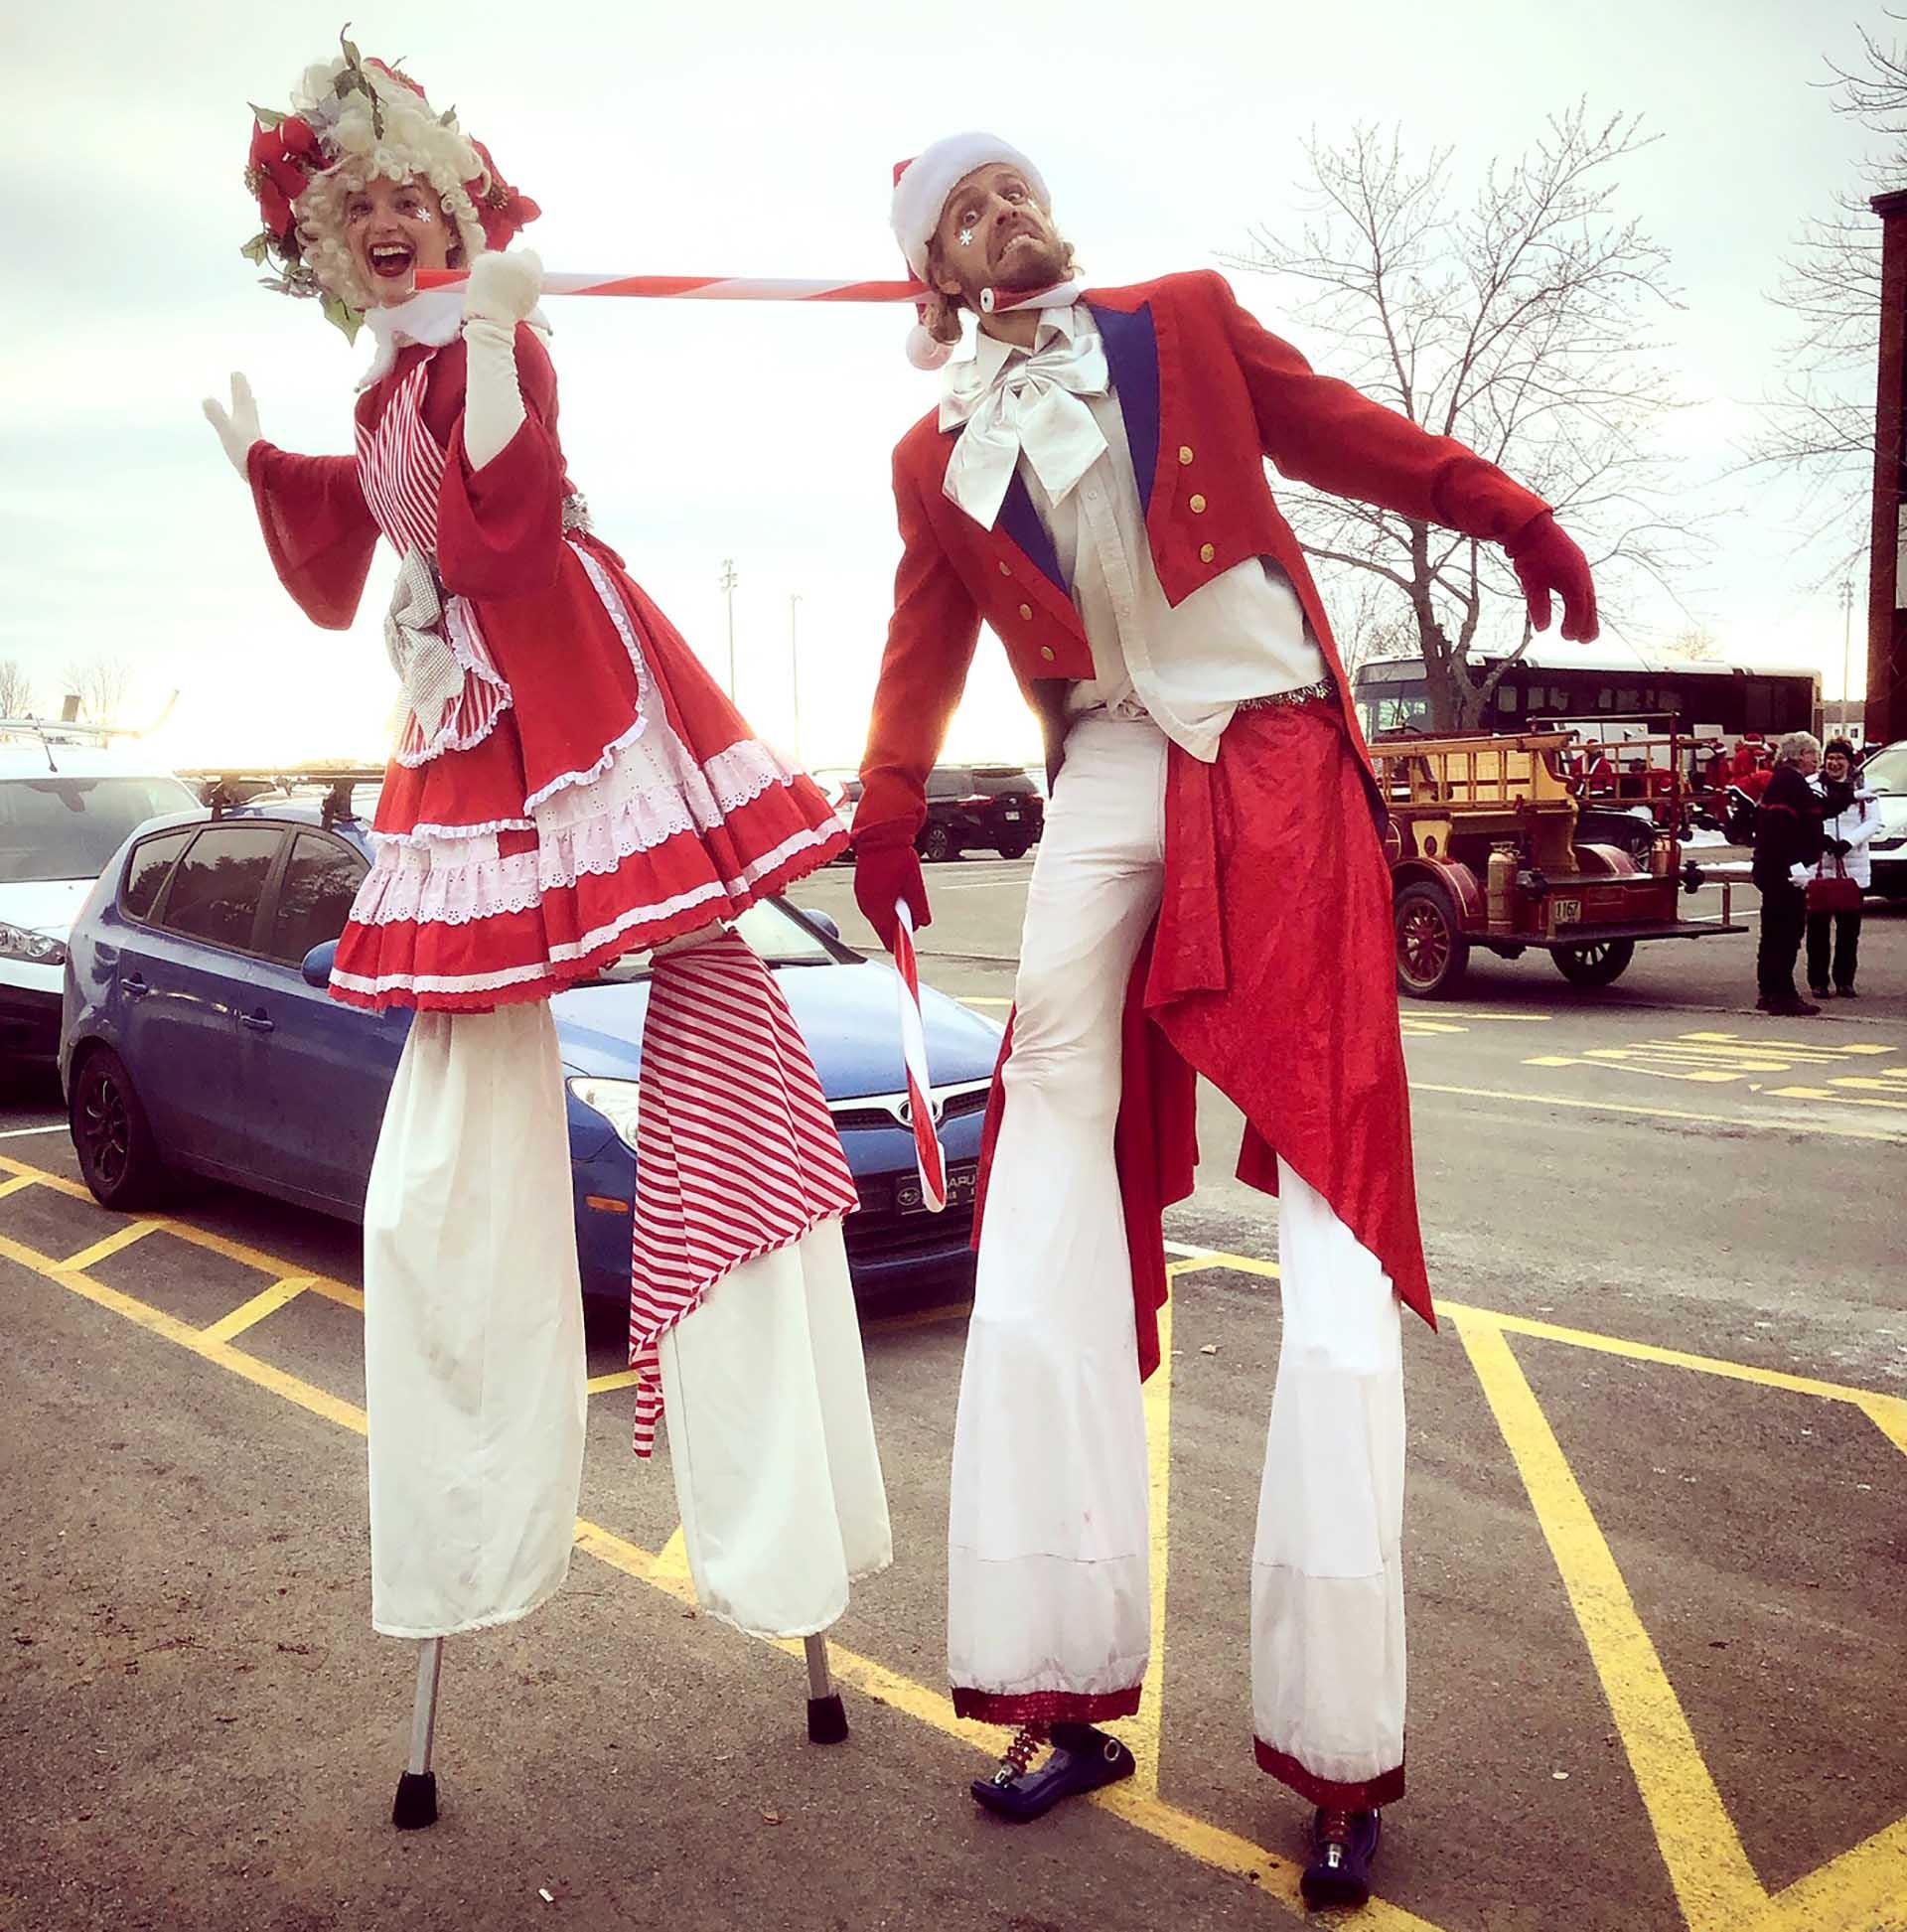 AllezUp Circus